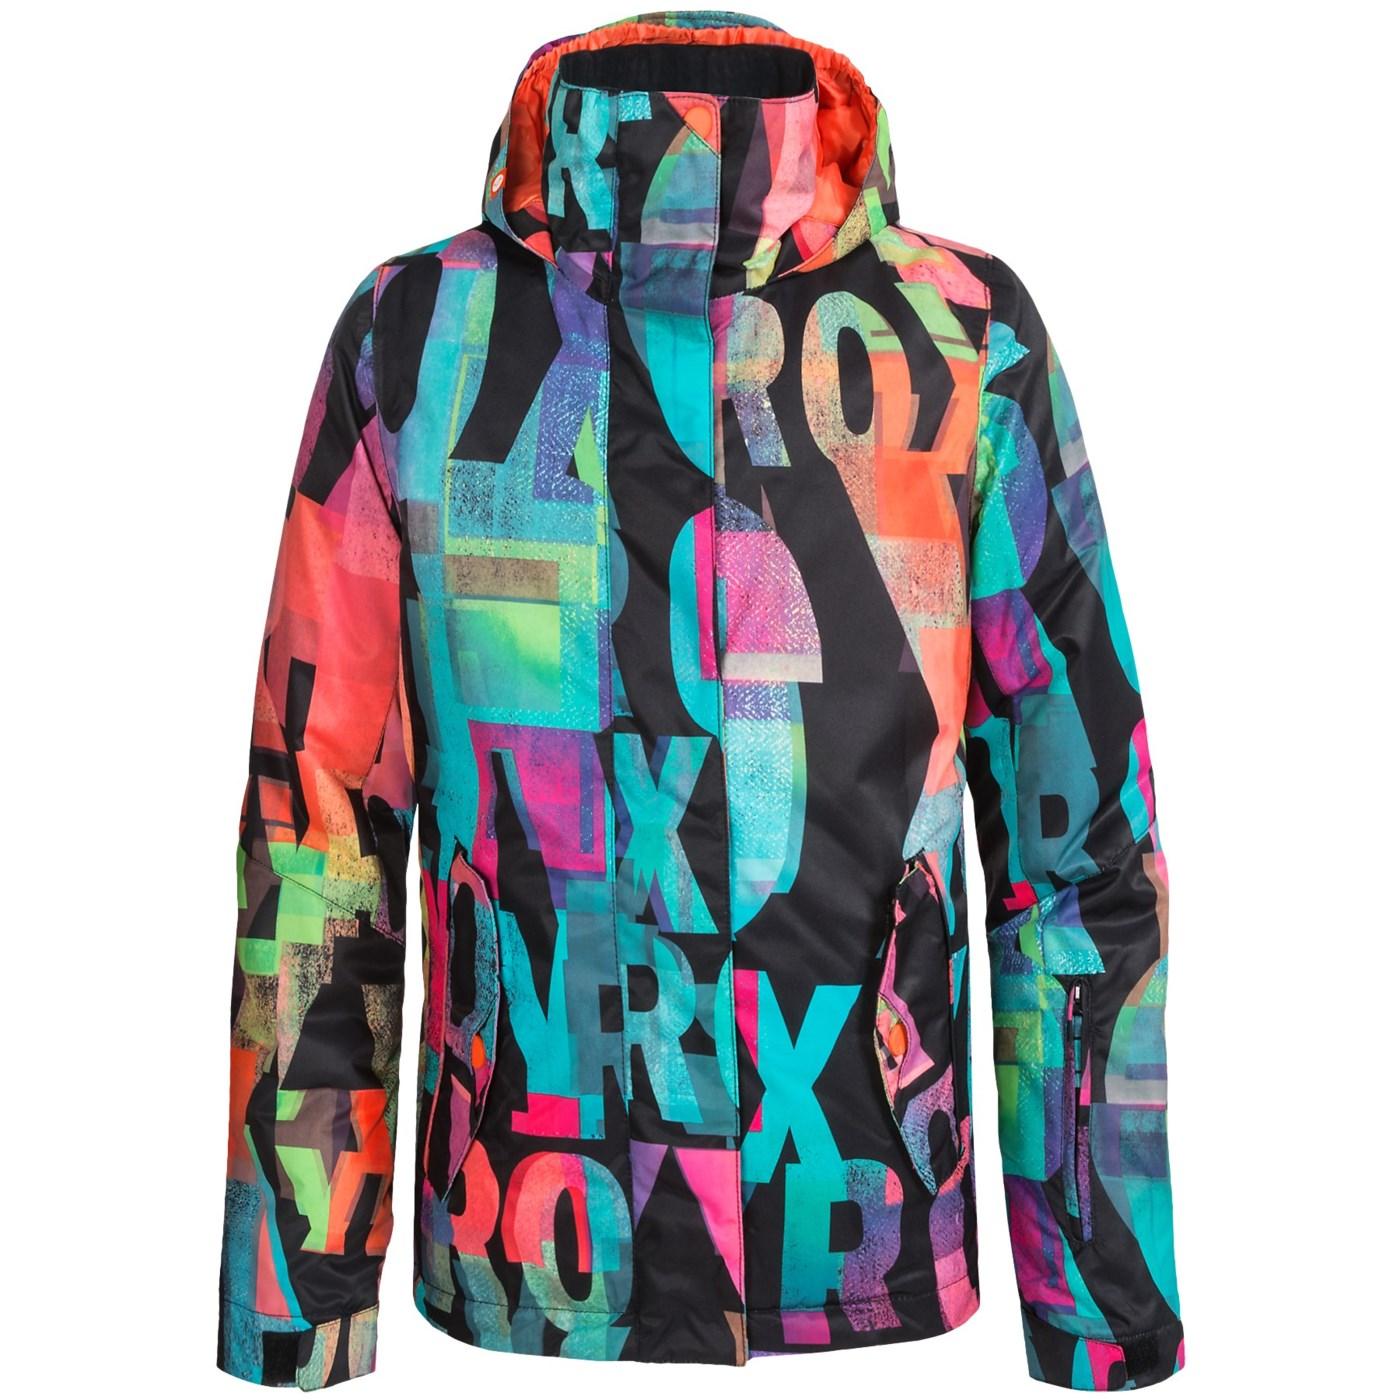 a4fbb94c6 Roxy Jetty Girl Ski Jacket (For Big Girls) 134RK 63 on PopScreen